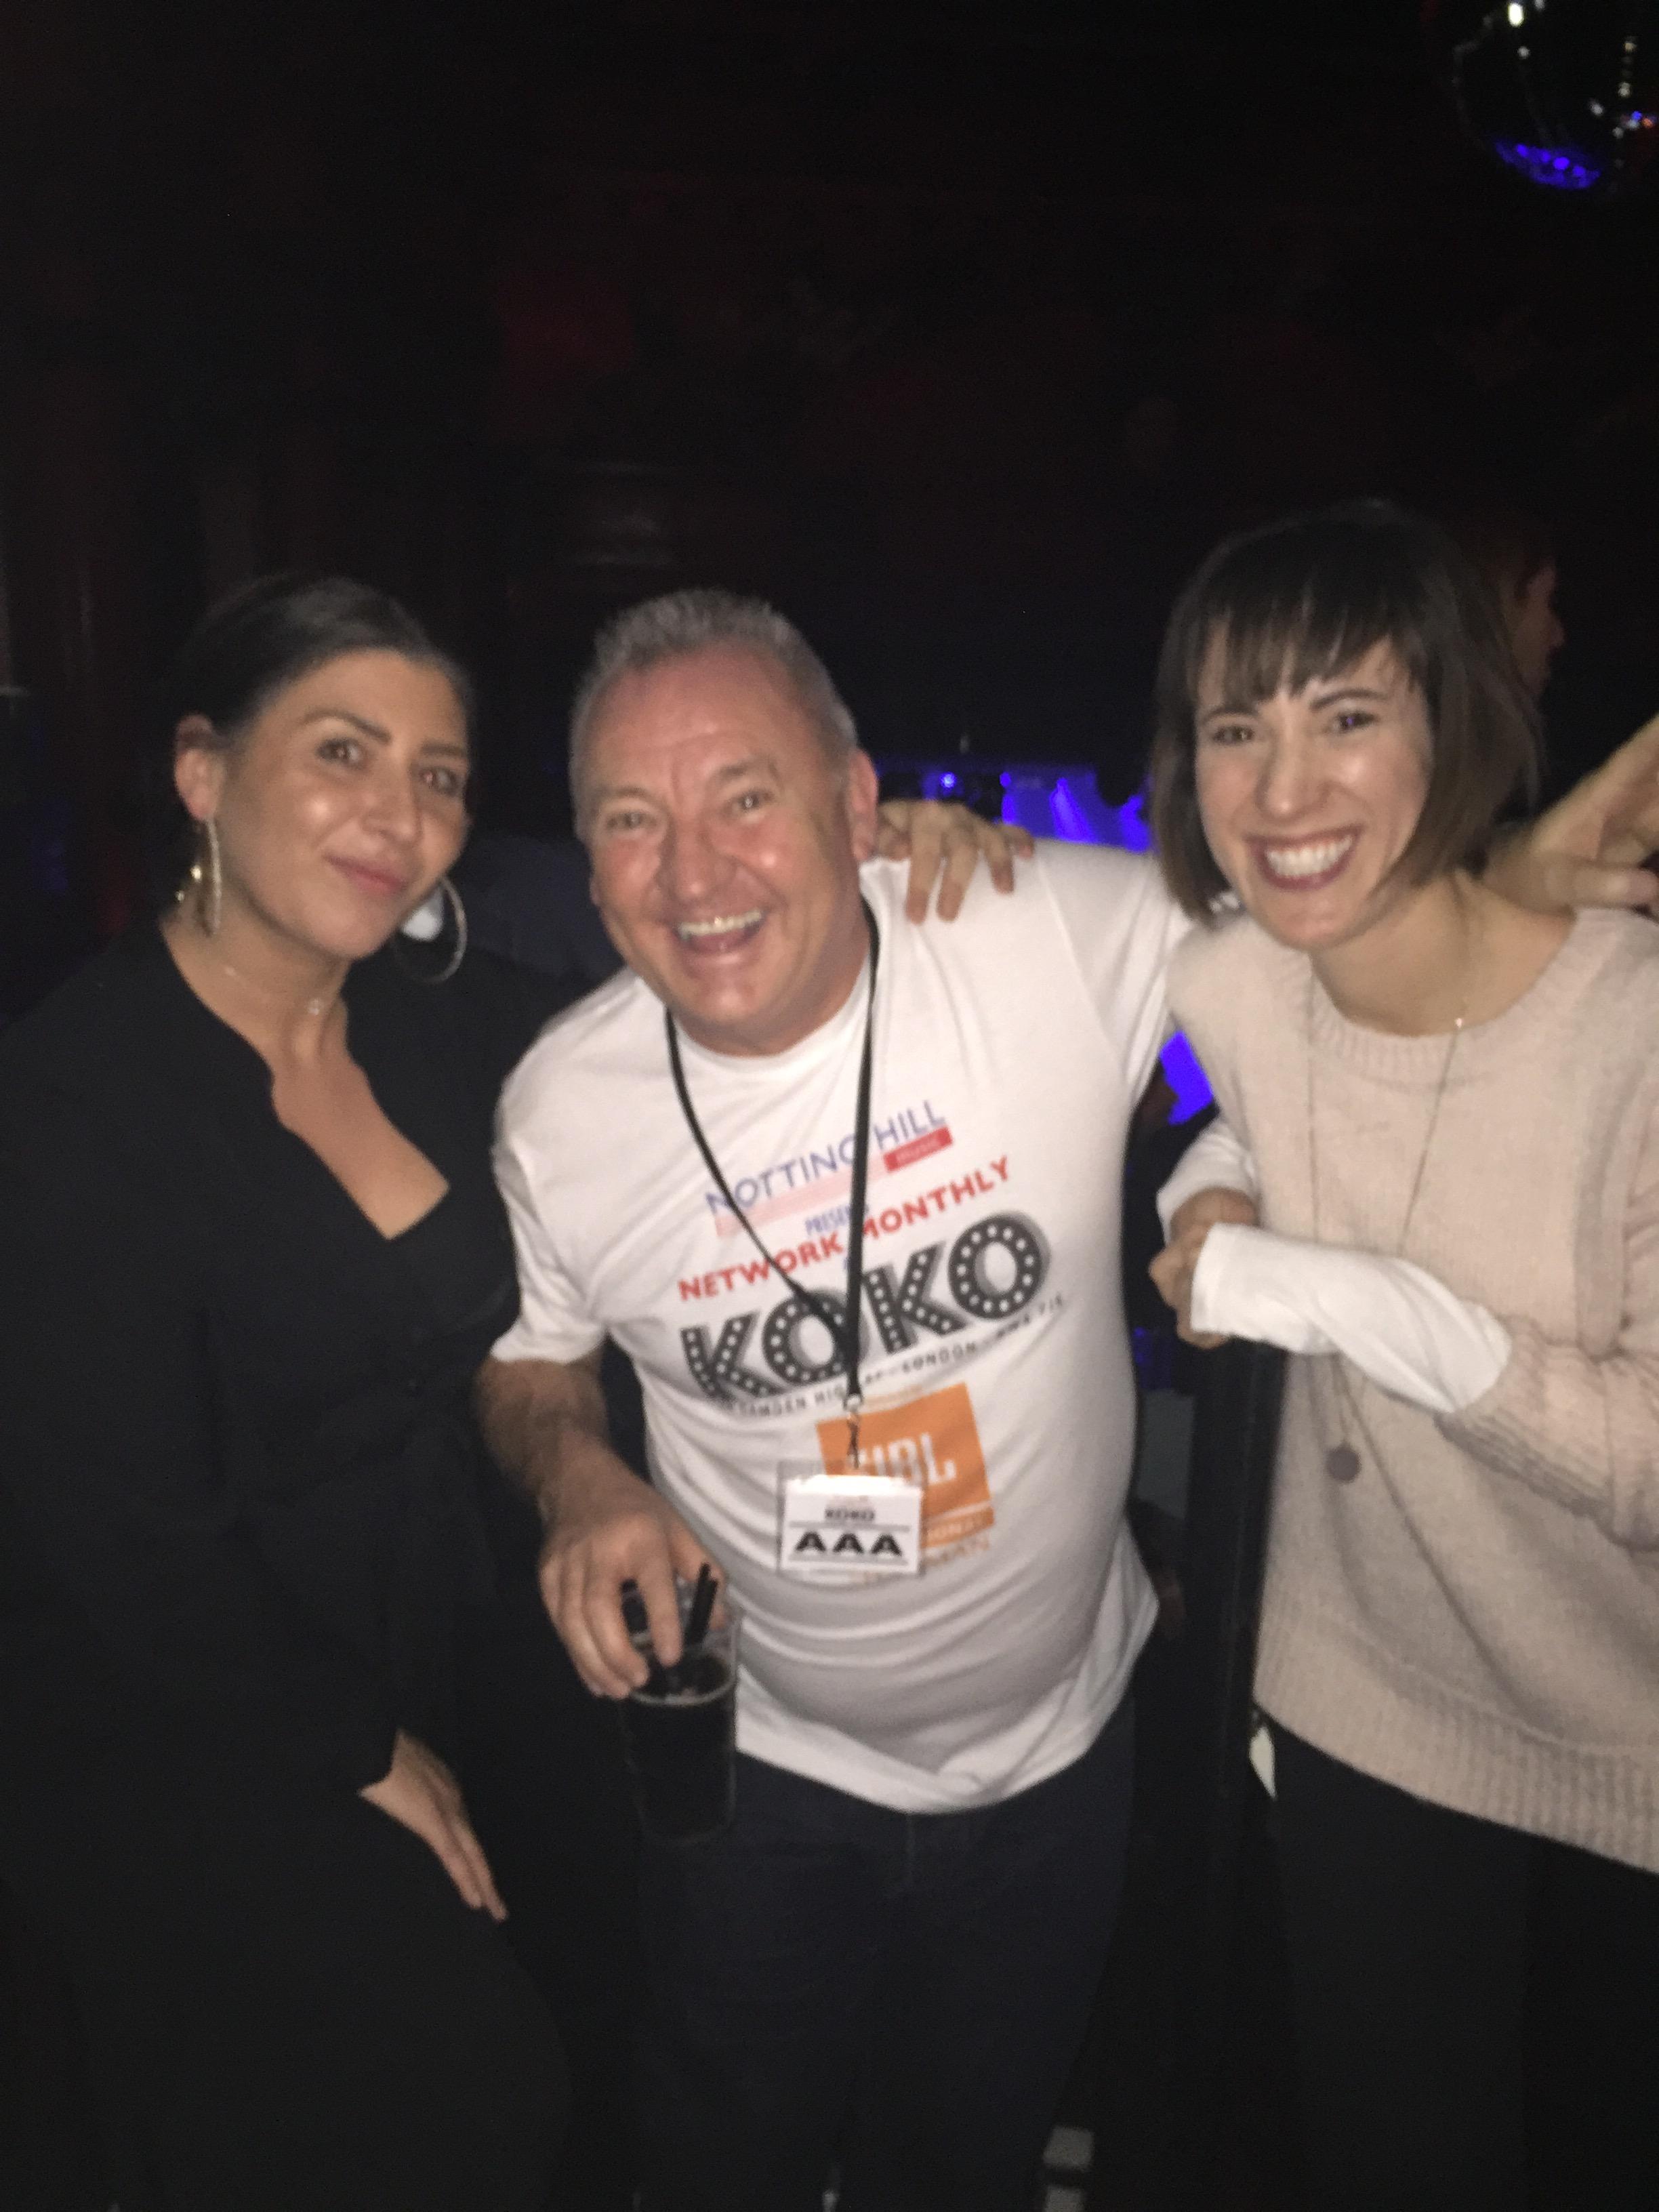 KOKO networking event with John Saunders & Francesca